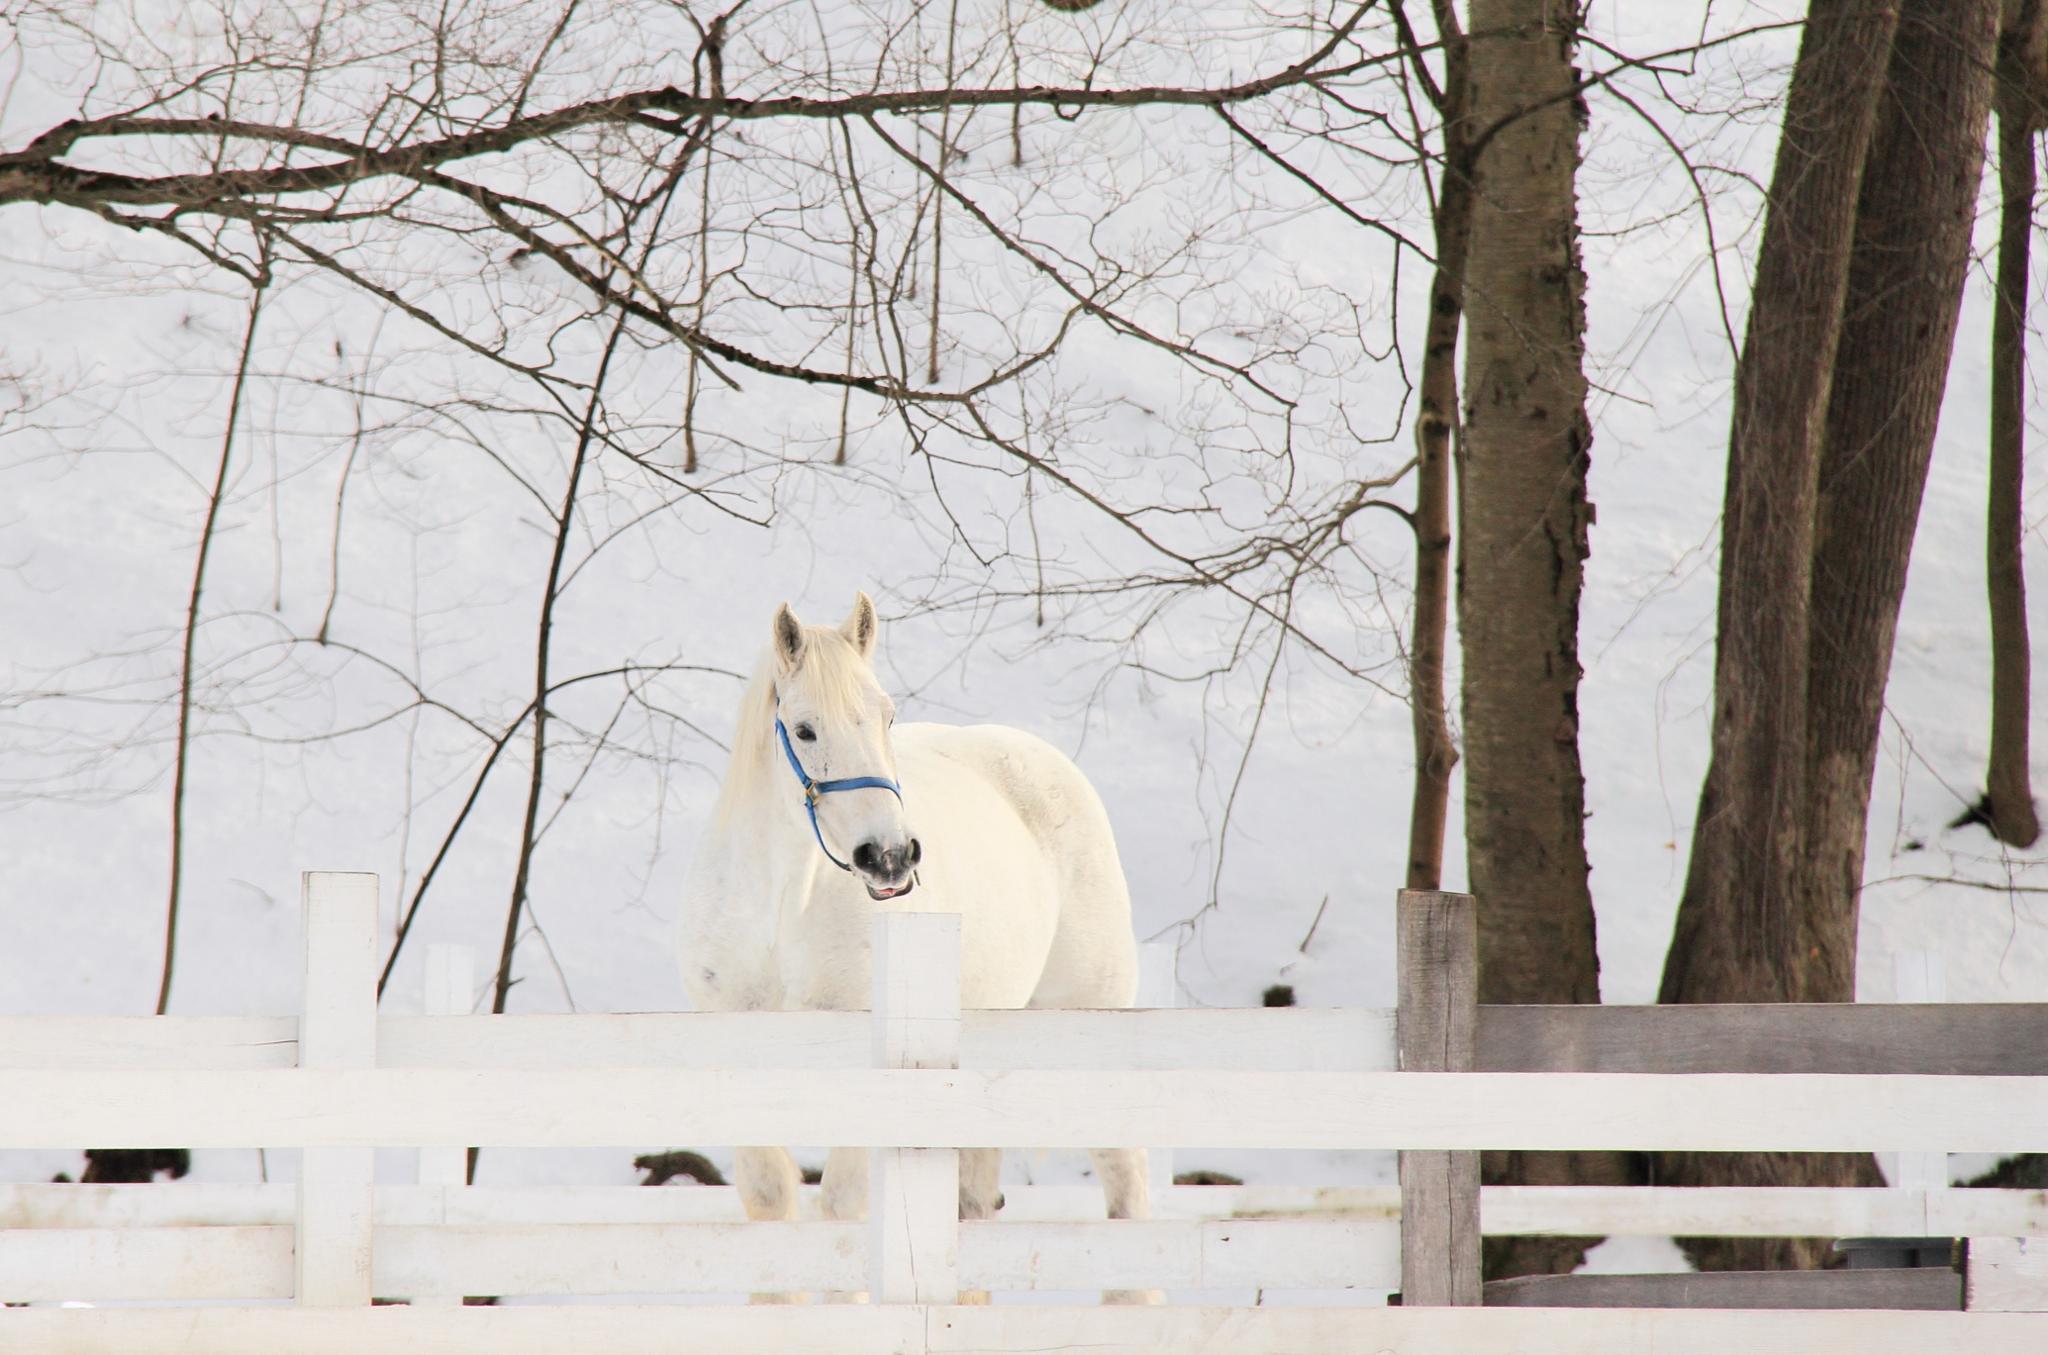 Winter Horse by michelle.vinnacombe